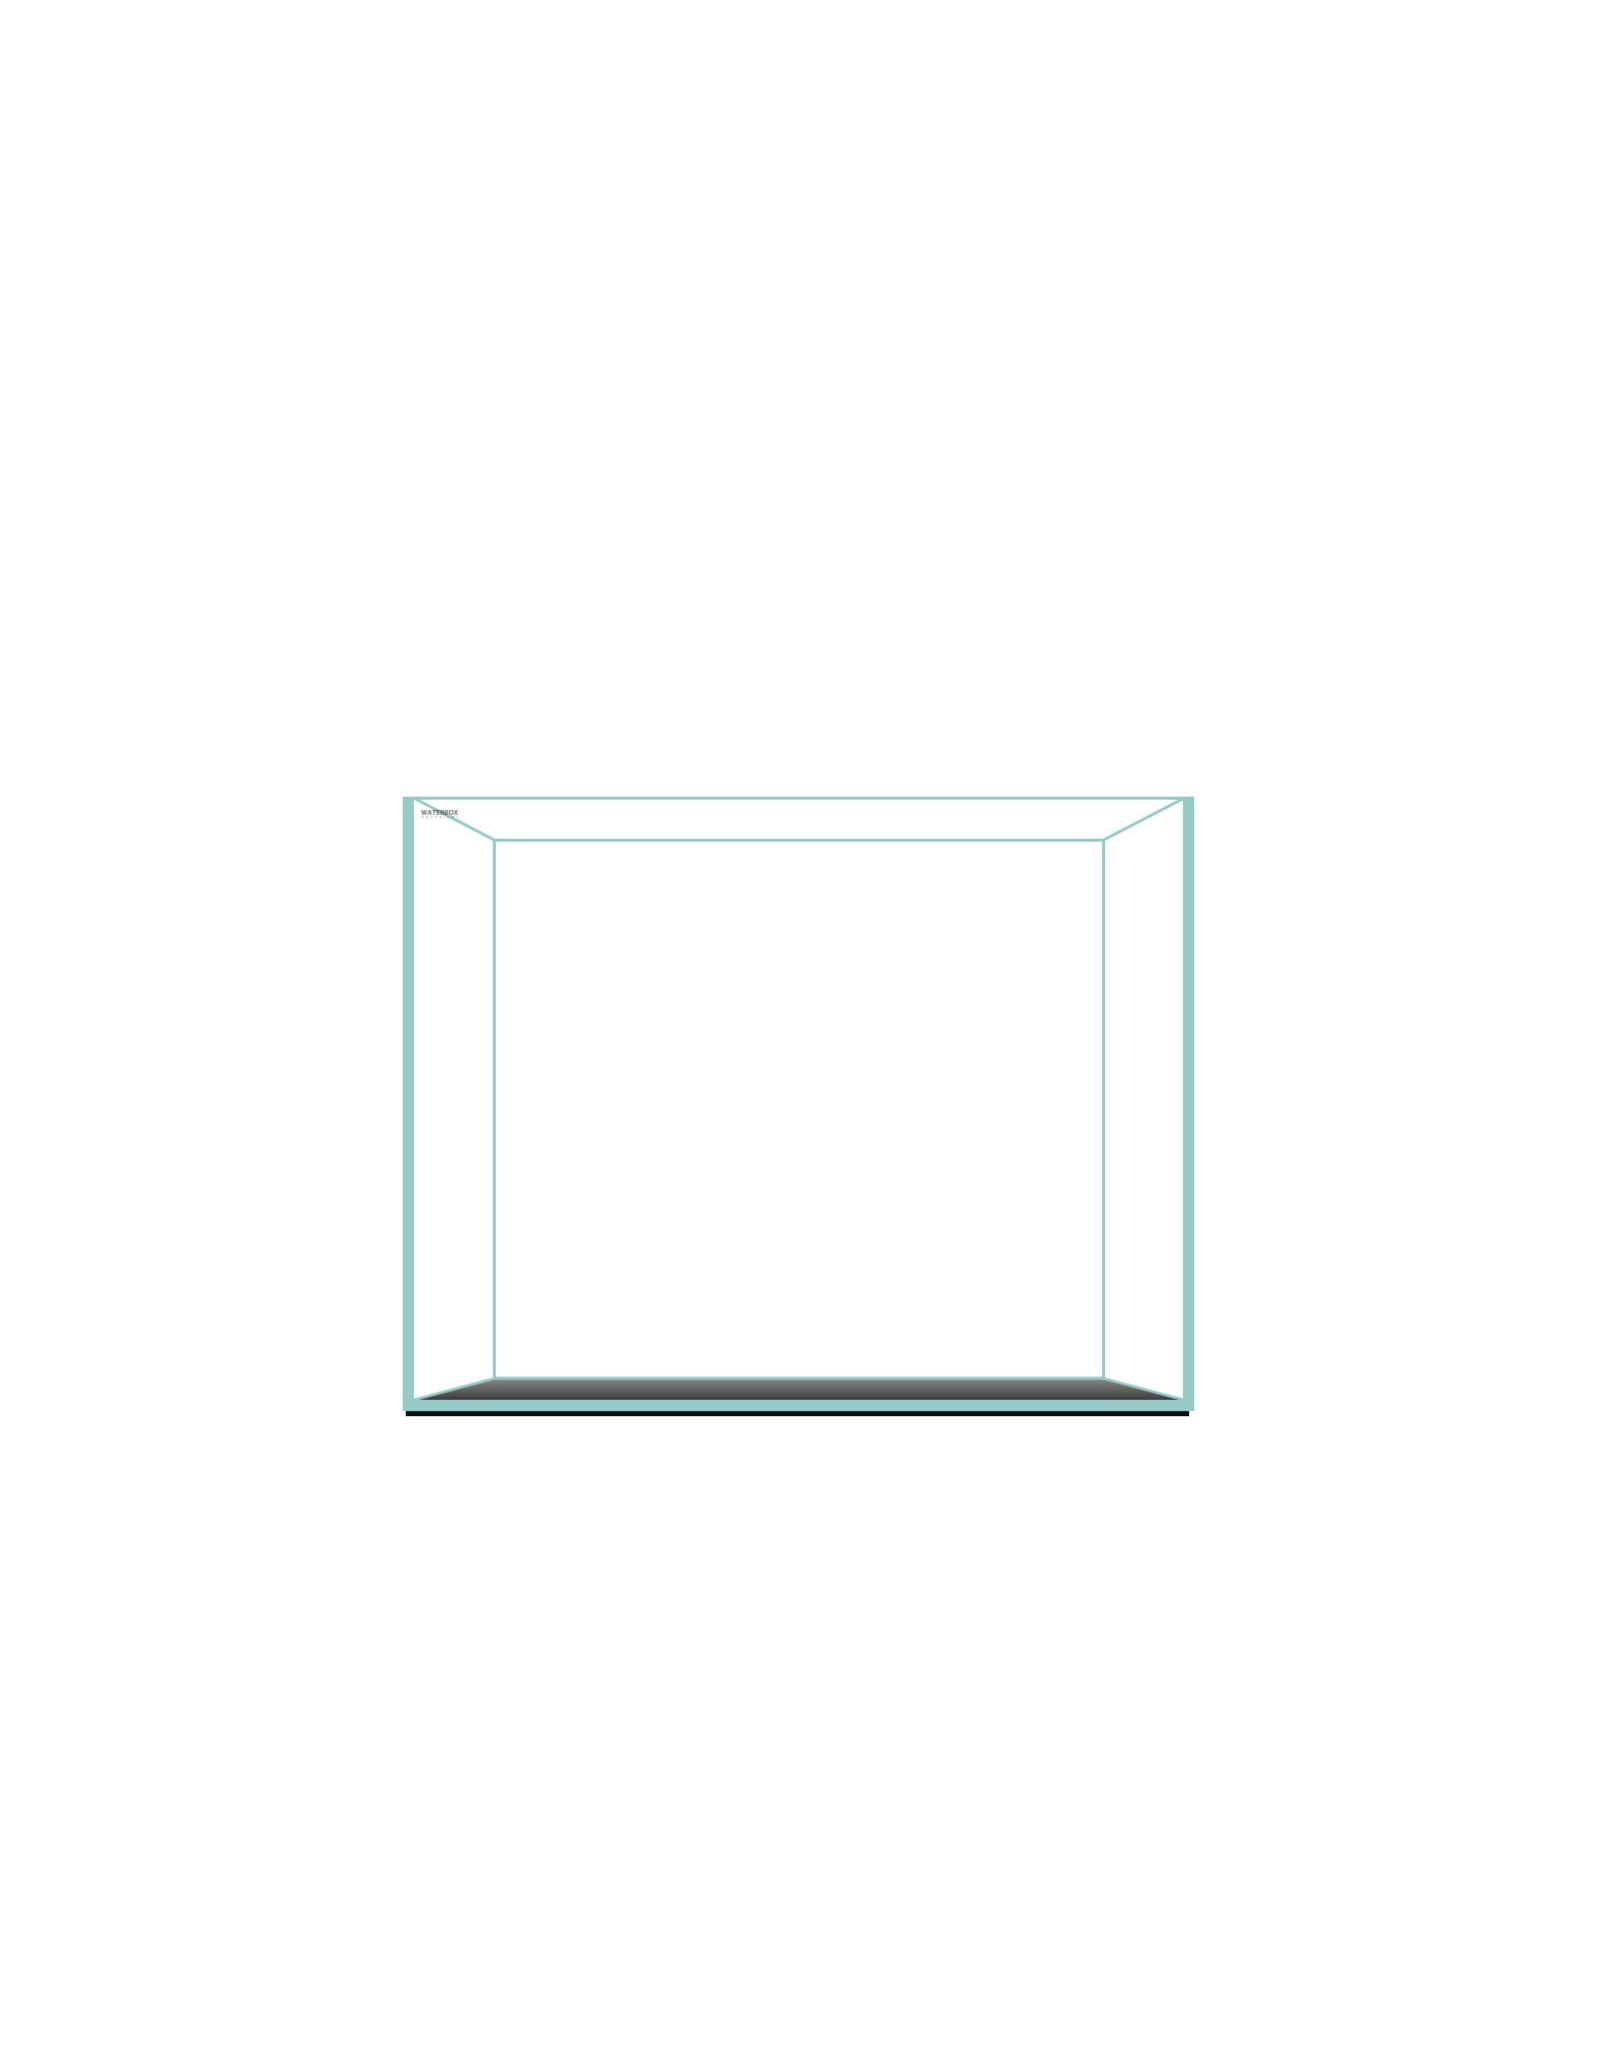 Waterbox Aquariums Waterbox Clear 2418